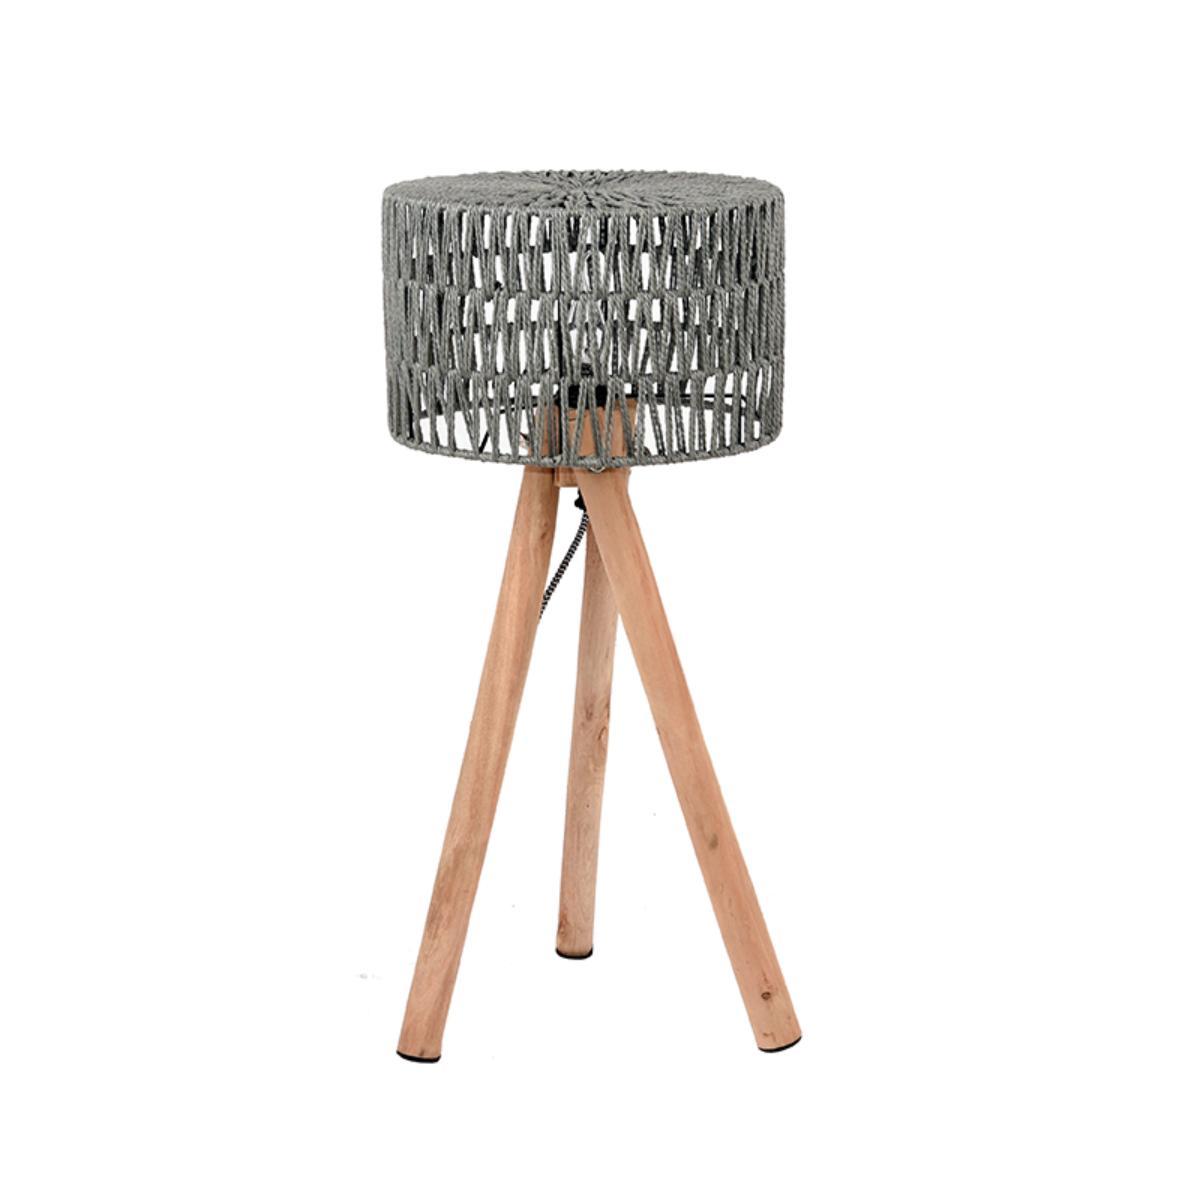 LABEL51 Tafellamp Stripe - Grijs - Mangohout